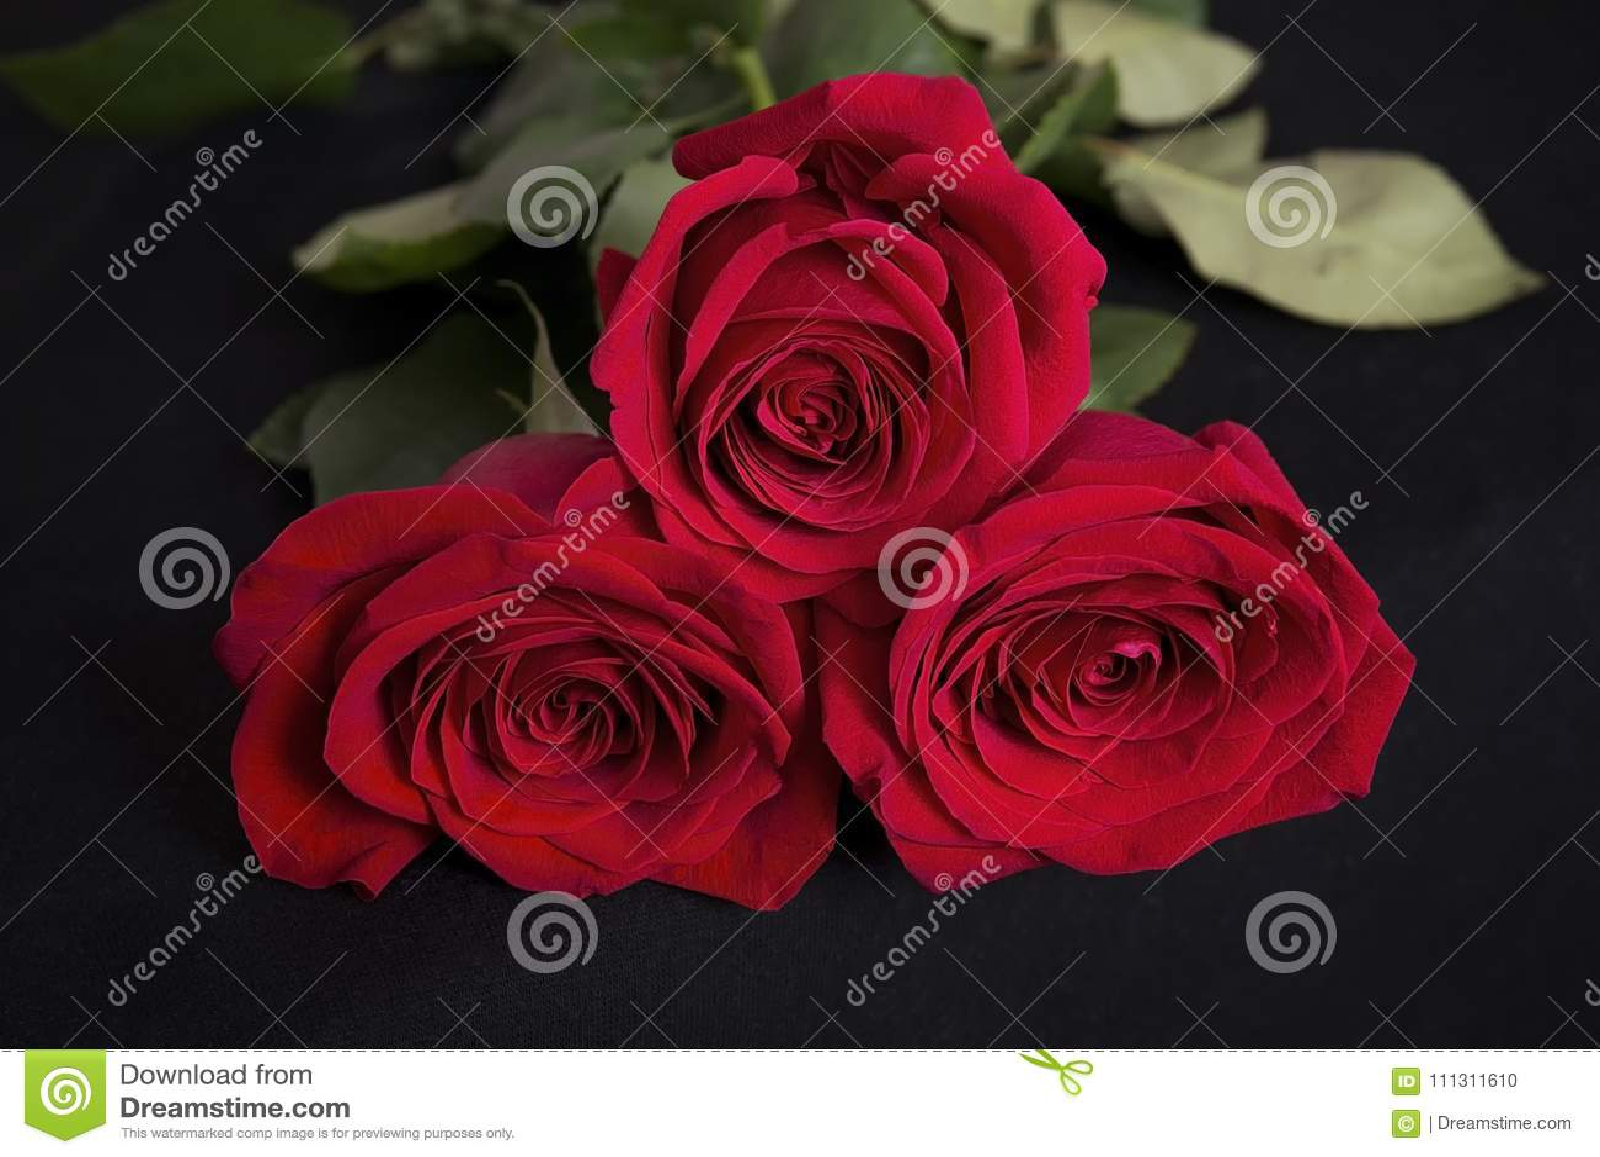 22b15b82a305 Tres Rosas Rojas En Fondo Negro Foto de archivo - Imagen de belleza ...